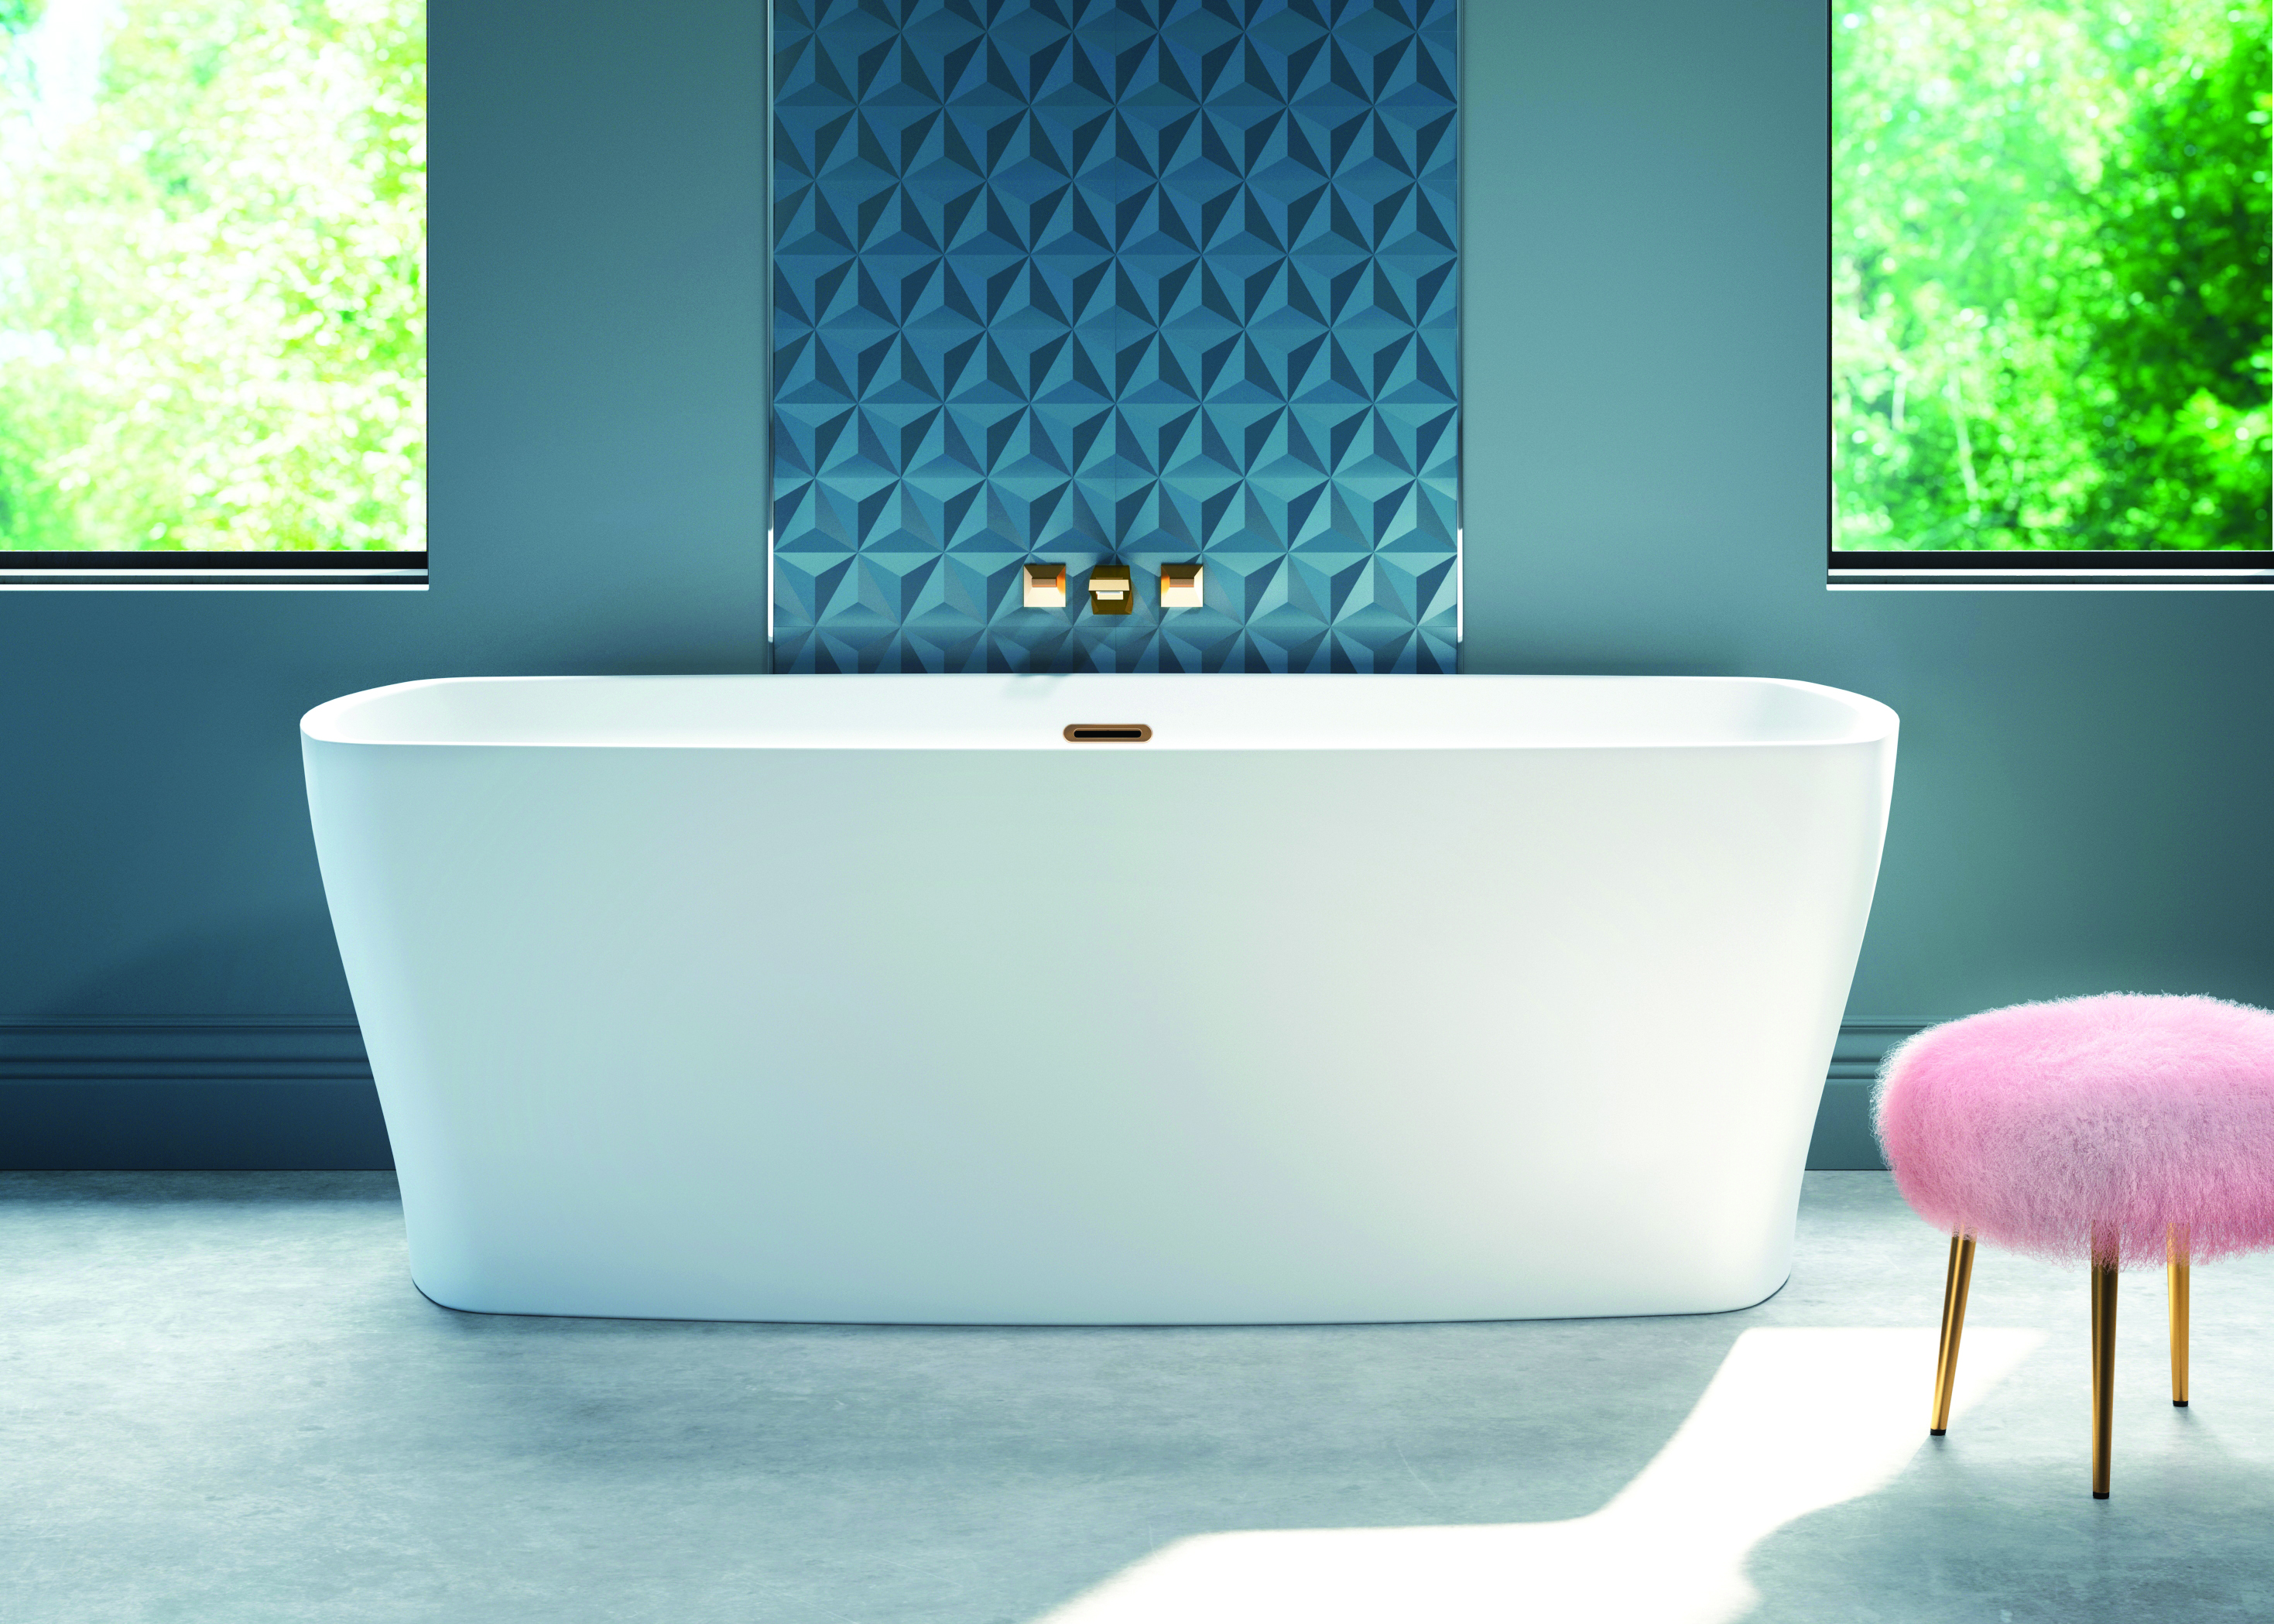 TW0821_BainUltra-Libra-freestanding-tub.jpg